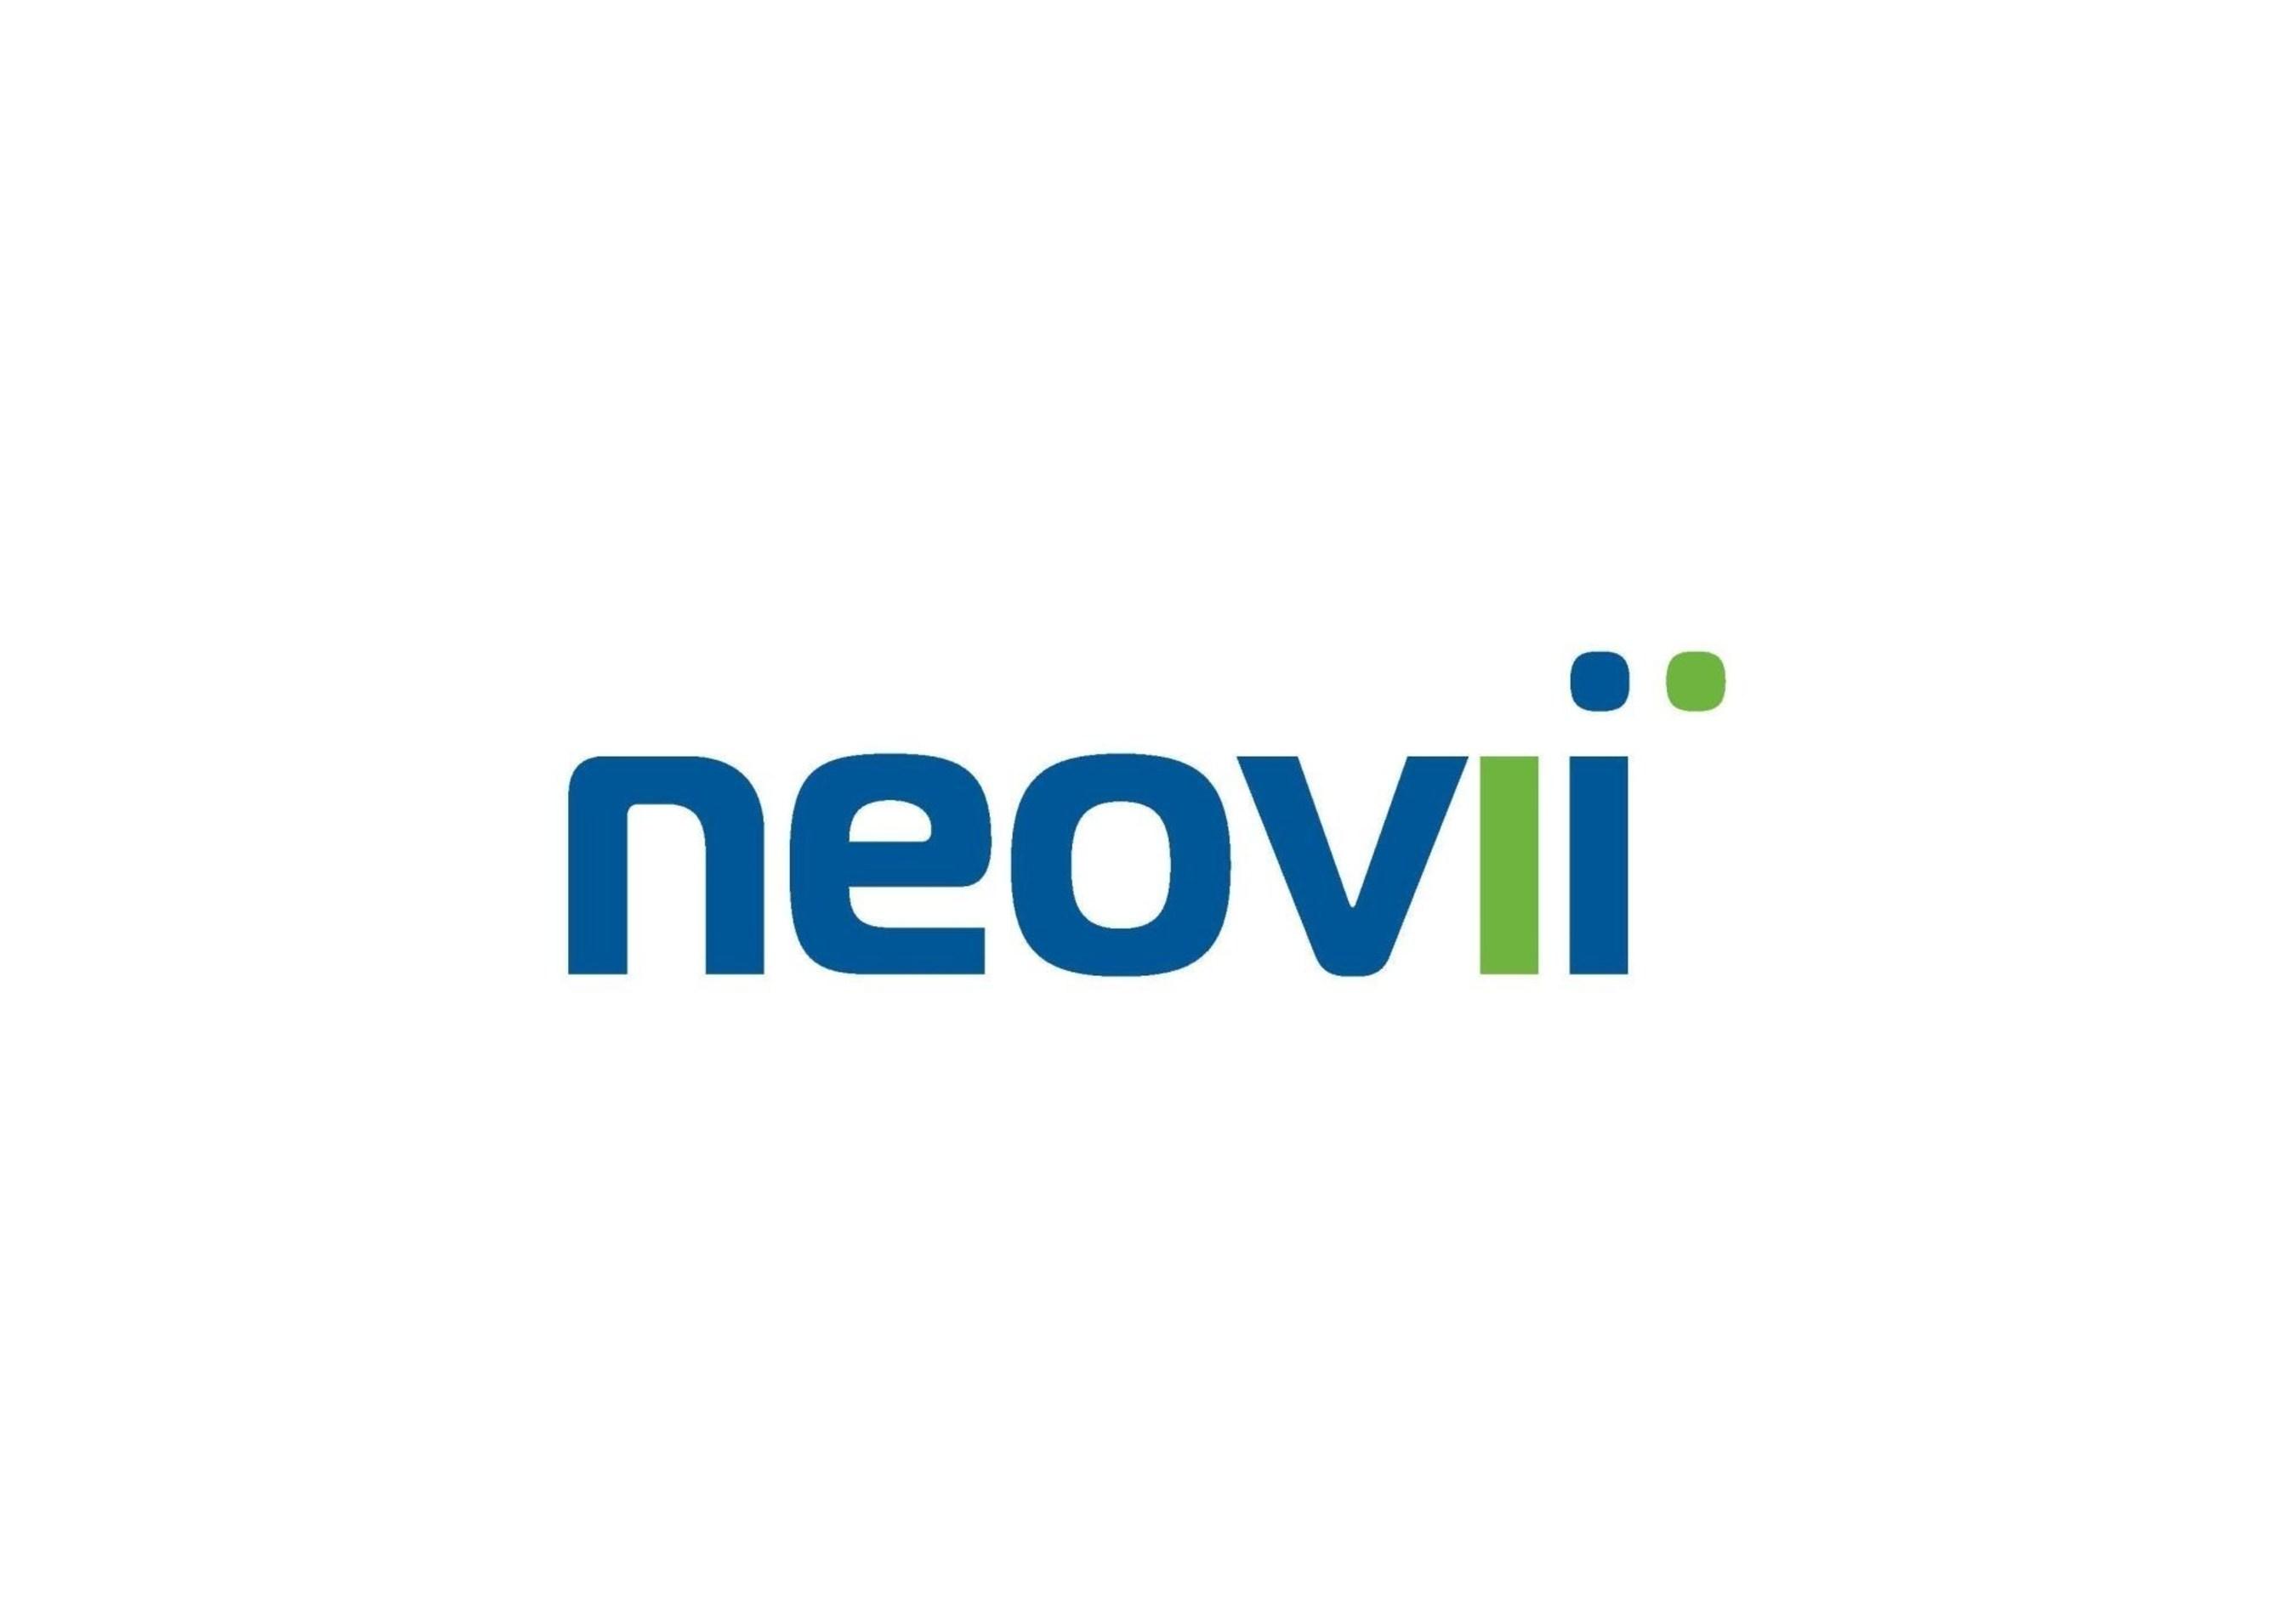 Neovii Pharmaceuticals AG Logo (PRNewsFoto/Neovii Pharmaceuticals AG) (PRNewsFoto/Neovii Pharmaceuticals AG)